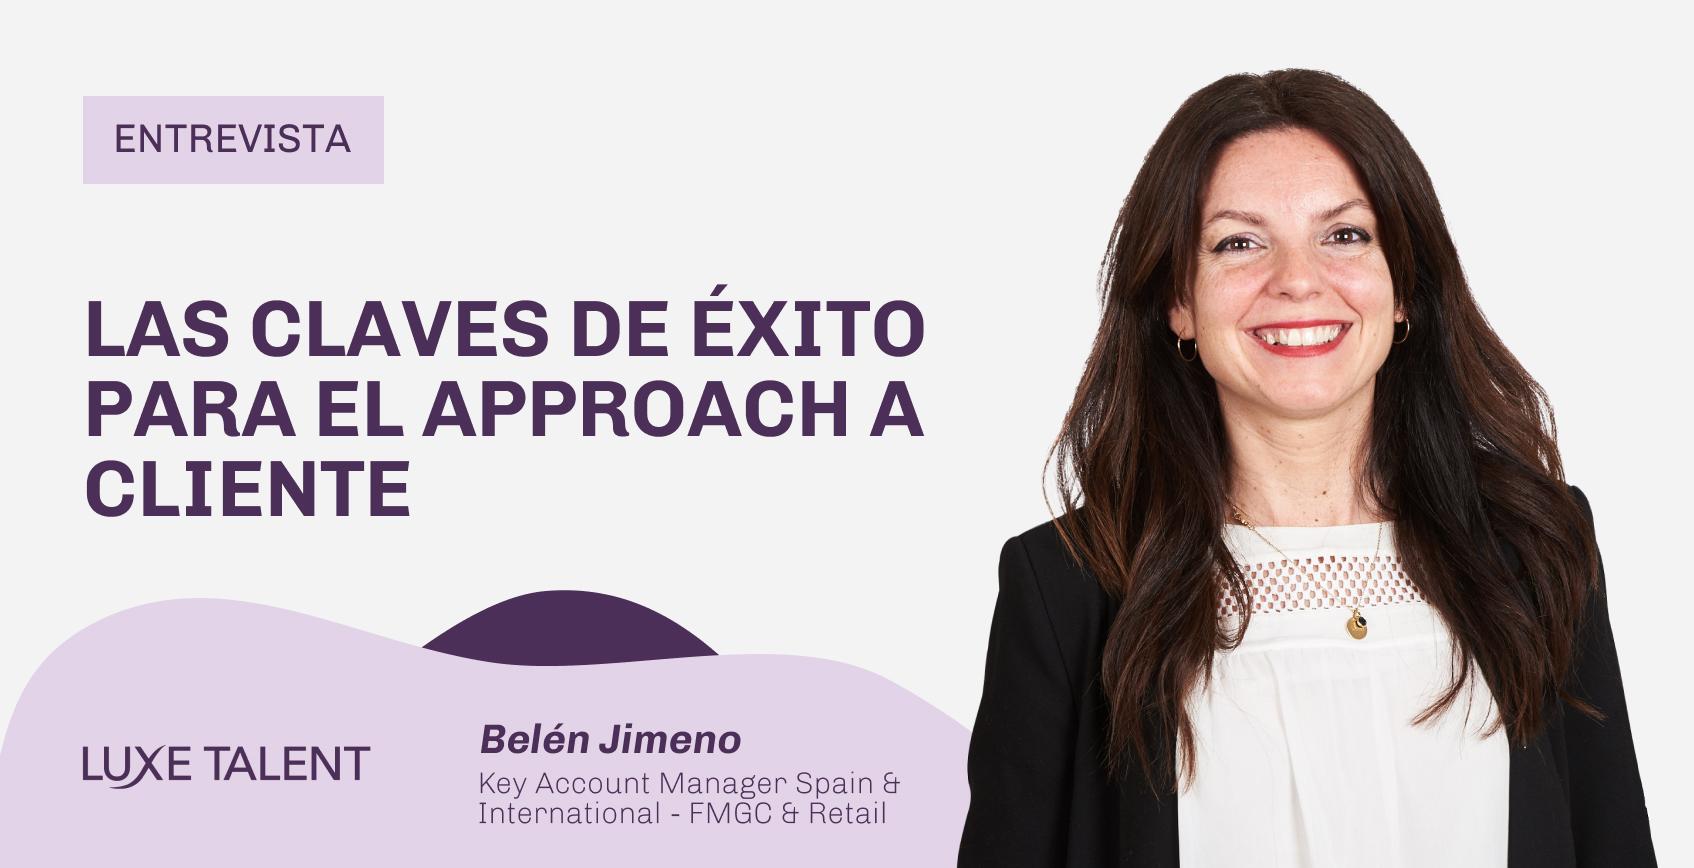 Blog Approach a Cliente con Belén Jimeno Key Account Manager de Luxe Talent